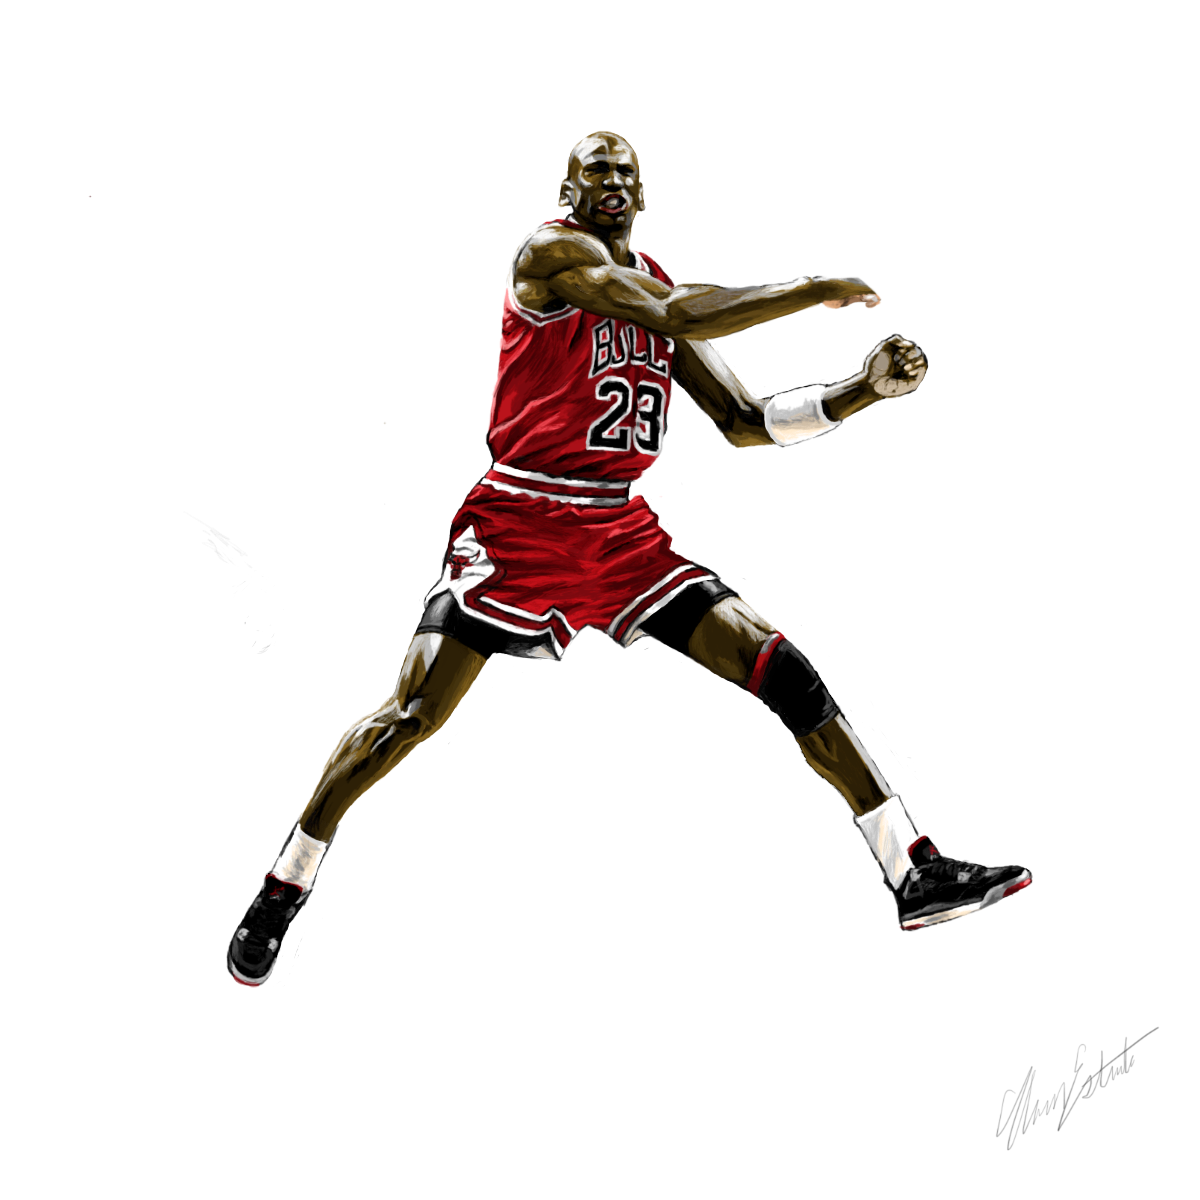 Galerry Michael Jordan by JHillPhD on DeviantArt